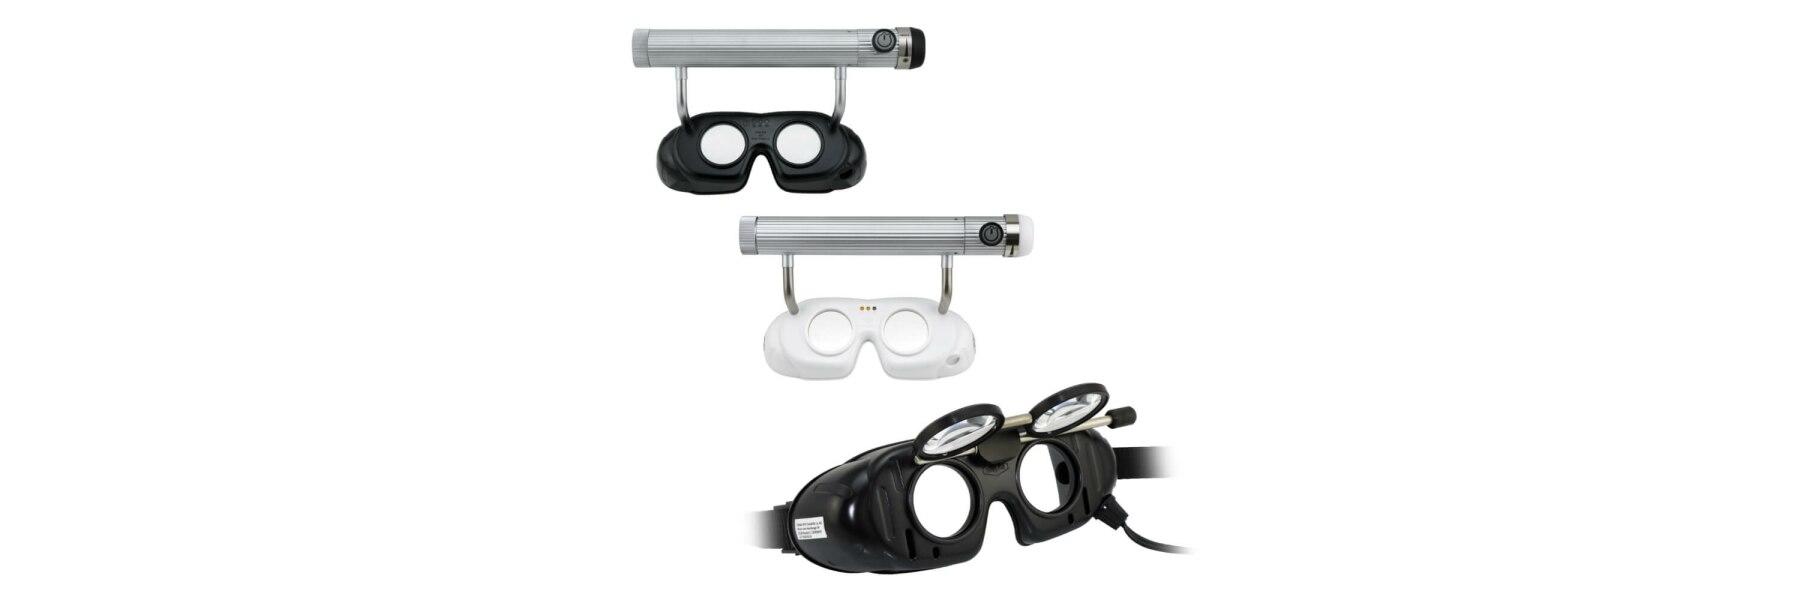 Frenzelbrille / Nystagmusbrille